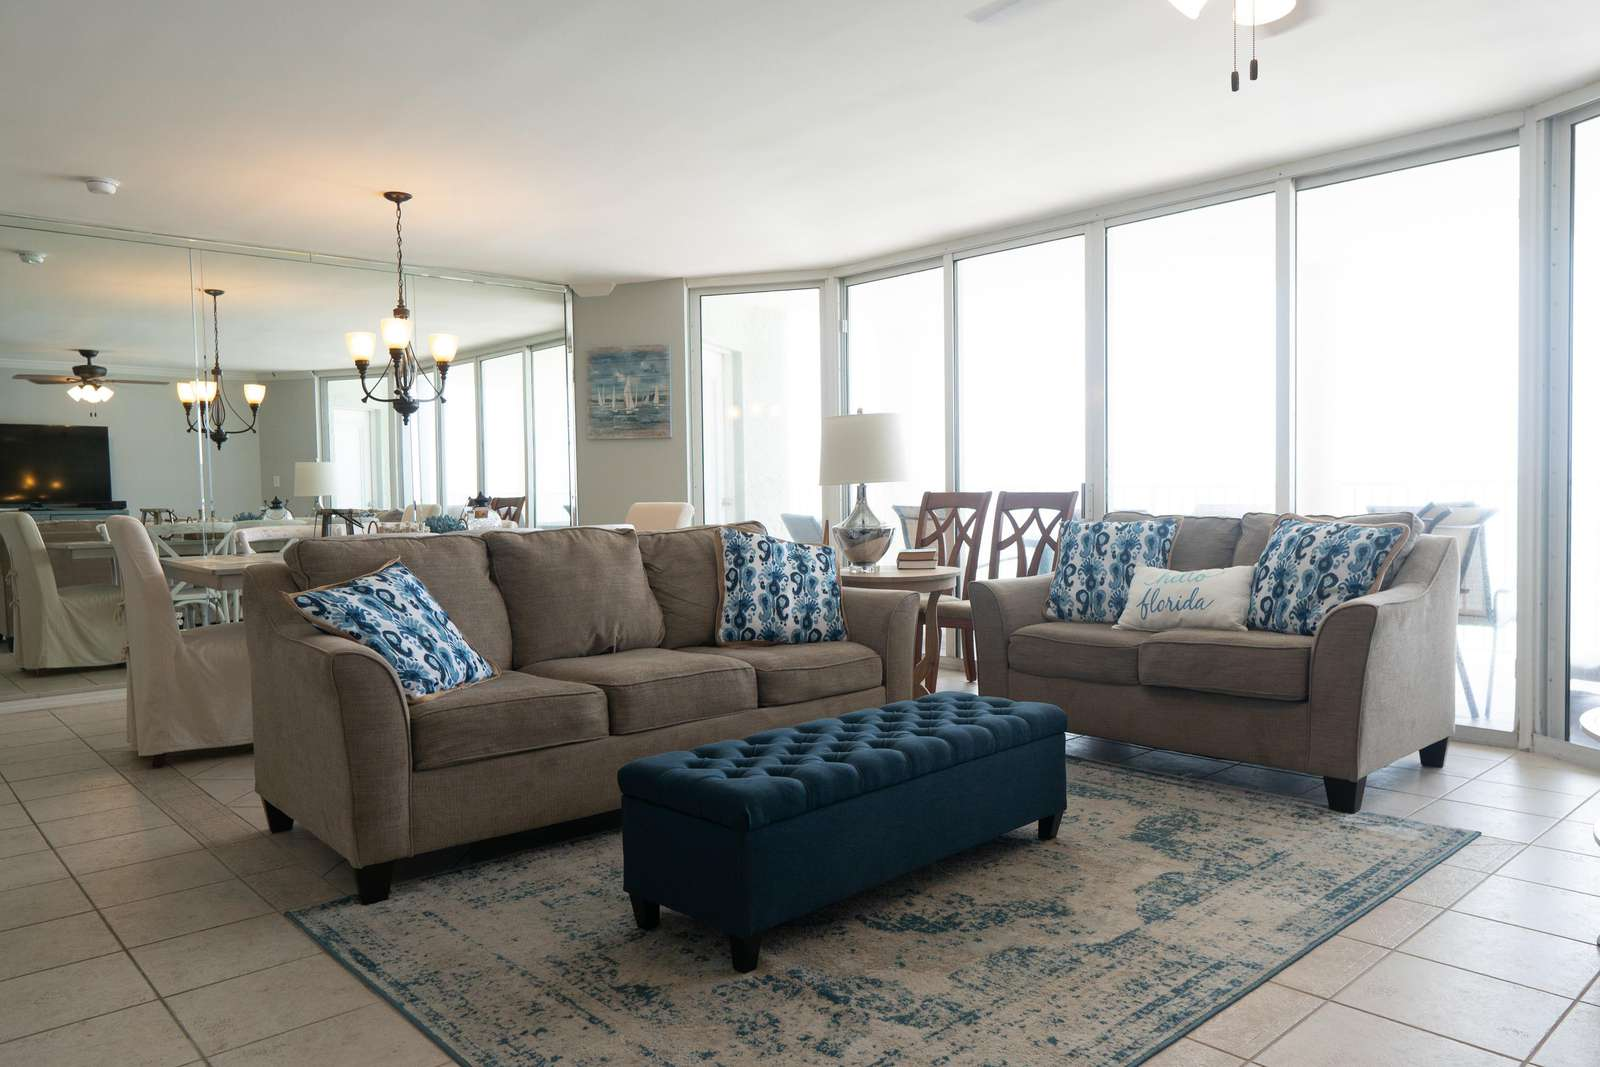 Long Beach T1 600 - property